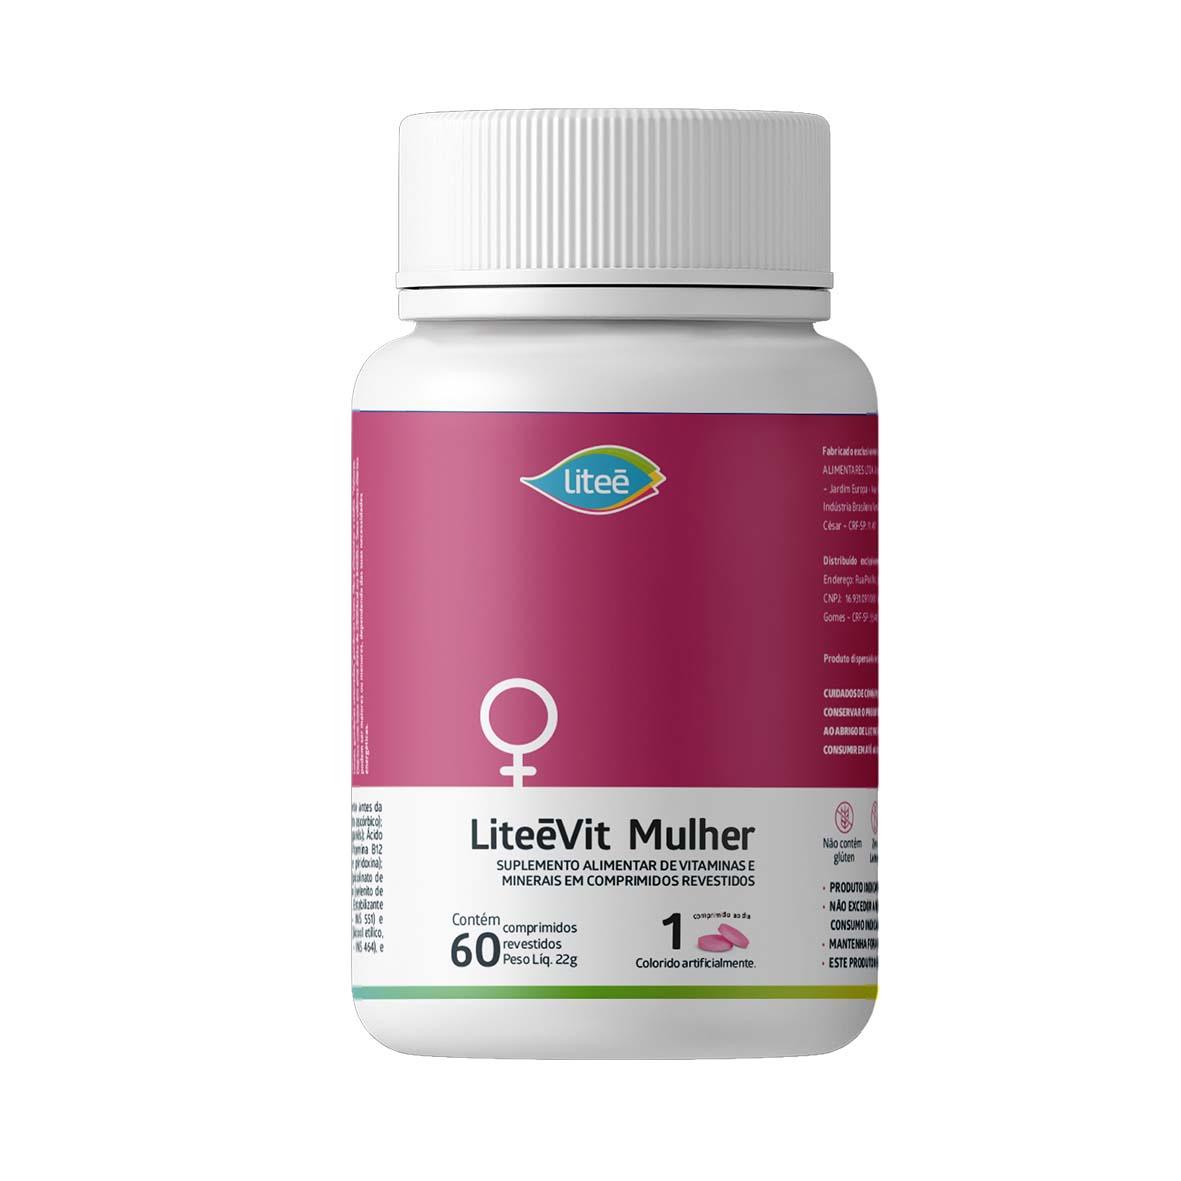 Multivitamínico LiteéVit Mulher - 60 Comprimidos